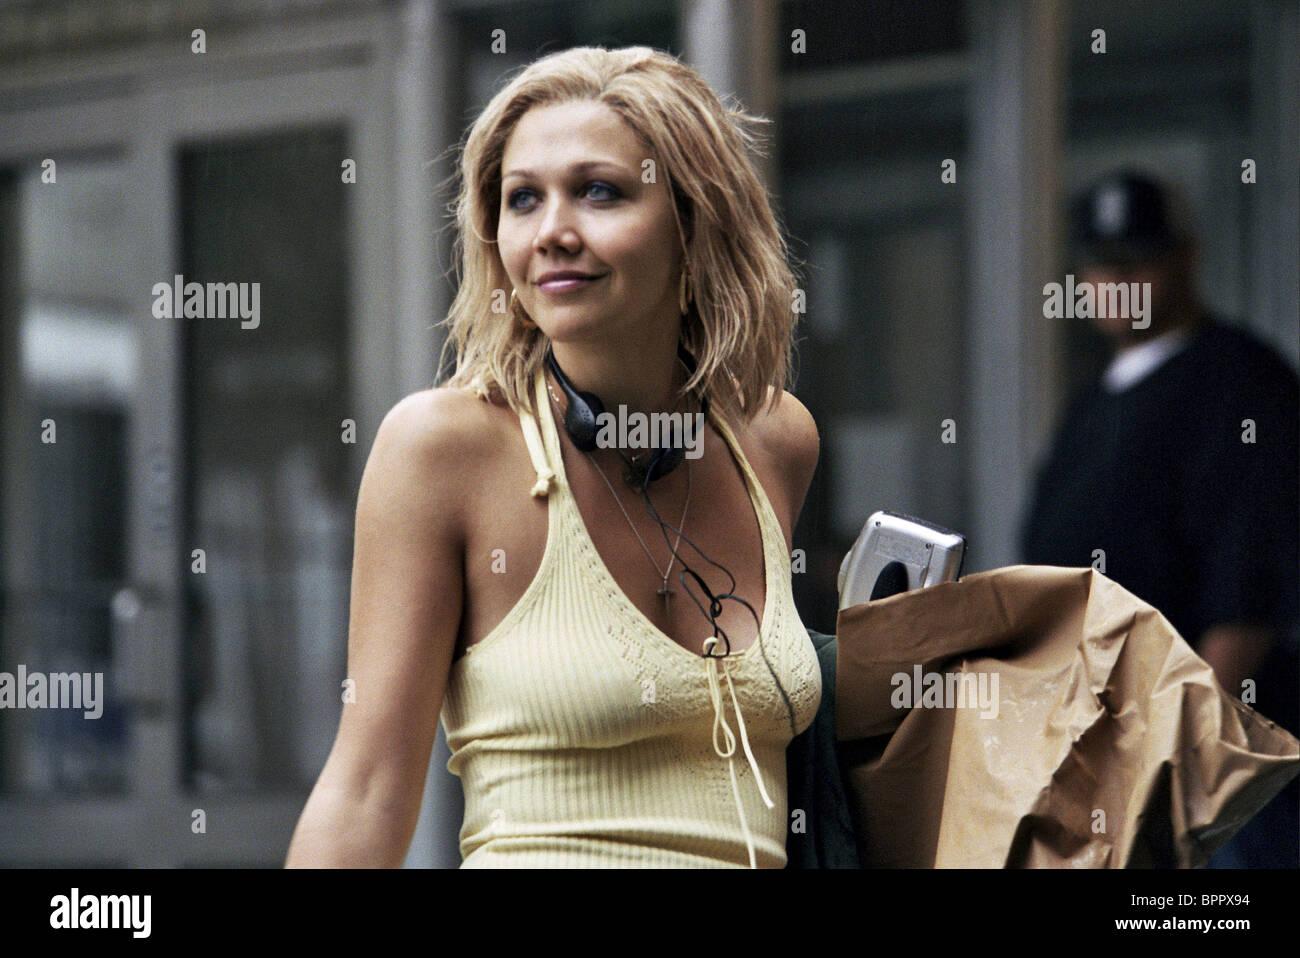 Maggie Gyllenhaal Nude Photos 6